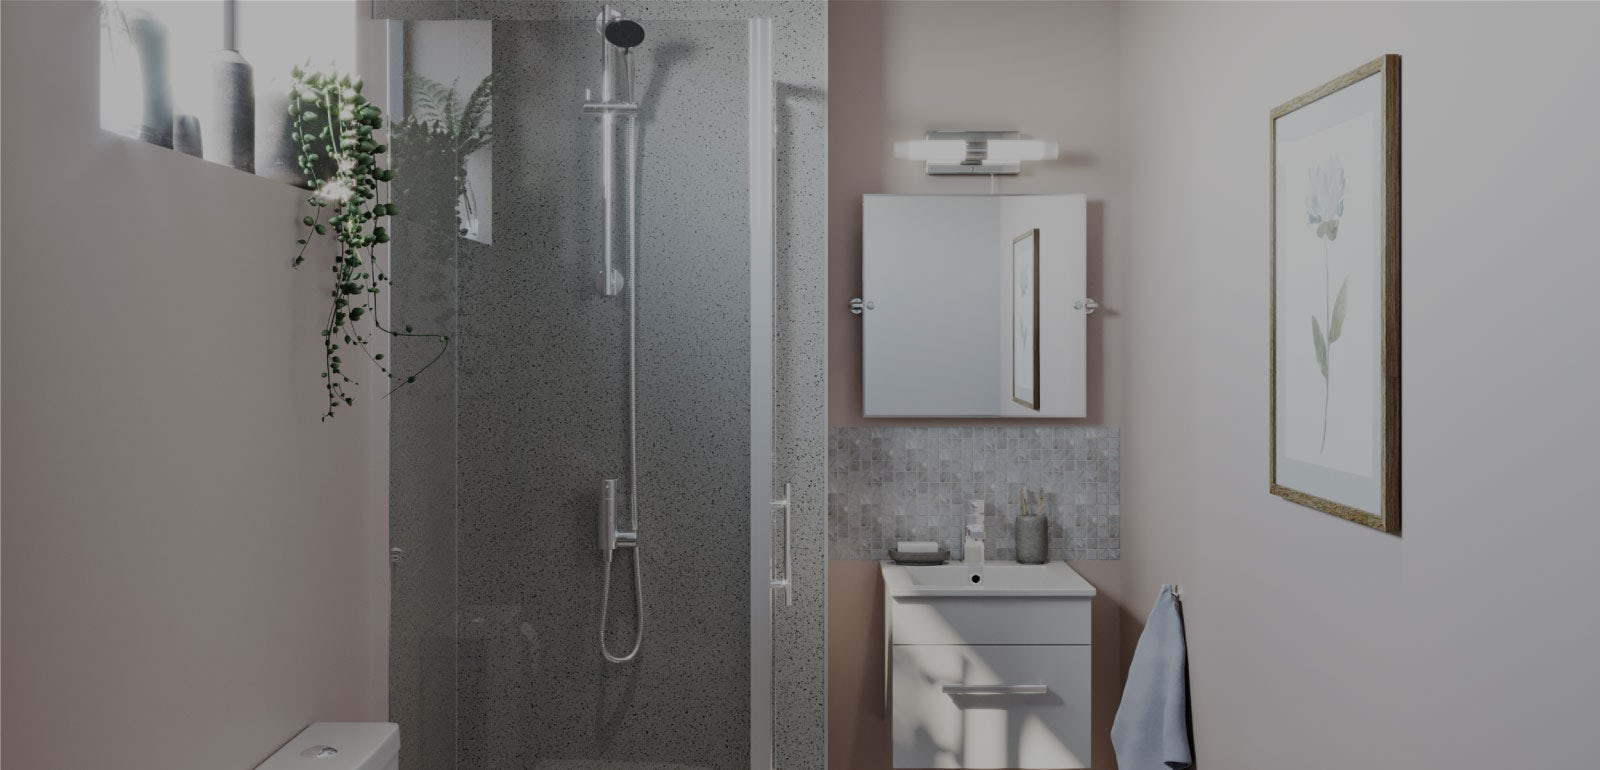 Small Spaces: Small bathroom colour ideas